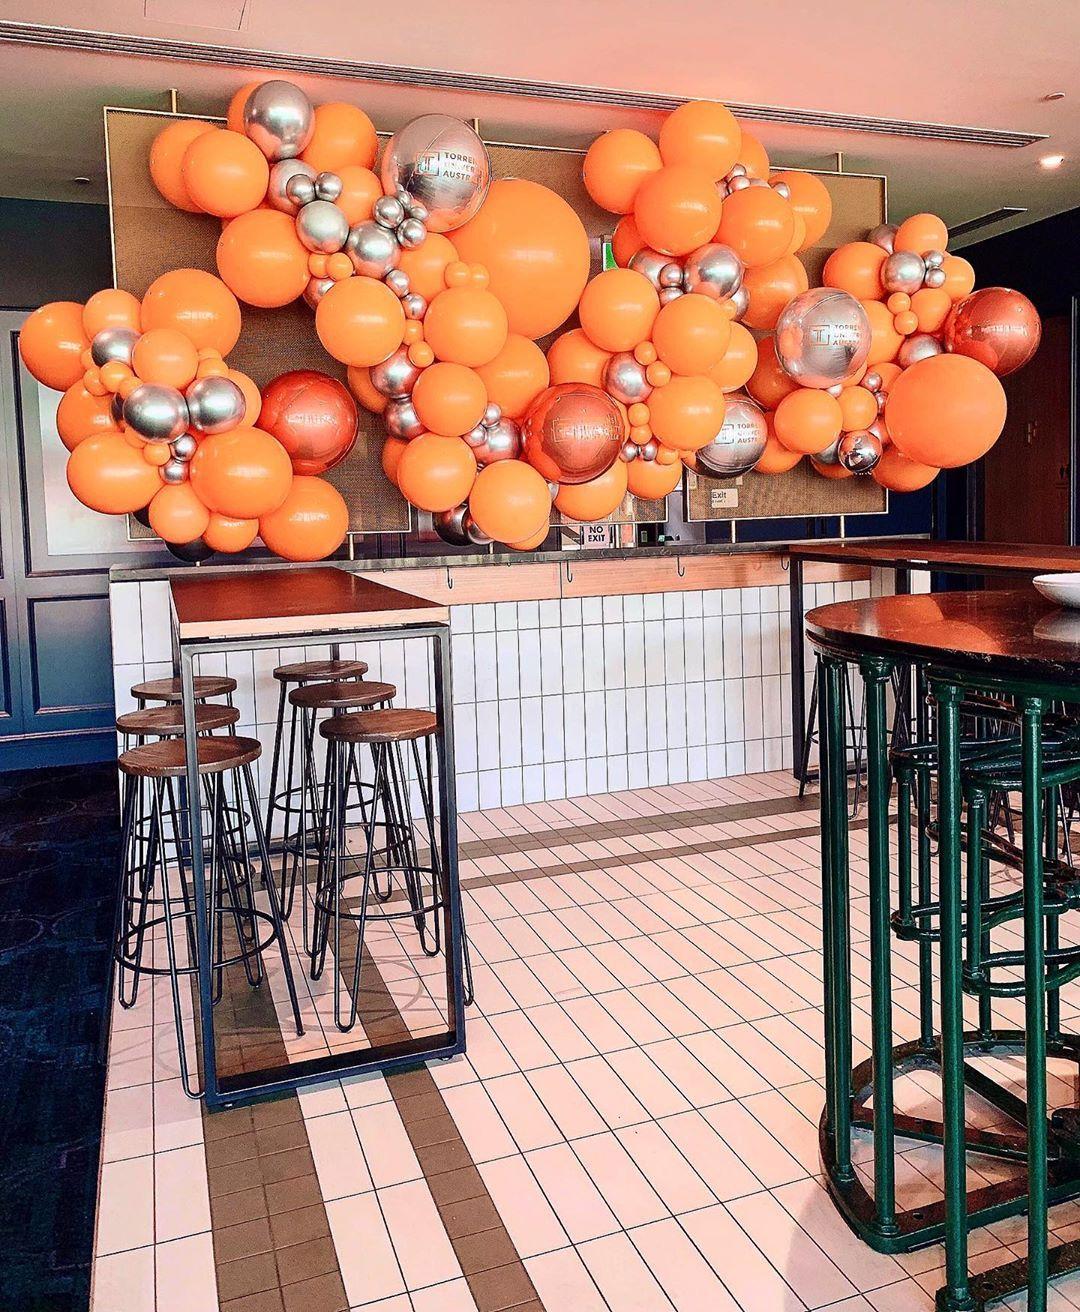 "ᵀᴴᴱ ᴸᴵᵀᵀᴸᴱ ᴮᴵᴳ ᴮᴬᴸᴸᴼᴼᴺ ᶜᴼᴹᴾᴬᴺᵞ on Instagram: ""Orange is the happiest colour! 🍊 A creation for the @torrensuni event this evening 🔥🔥🔥 #LittleBigBalloonCo #corporateevents…"""